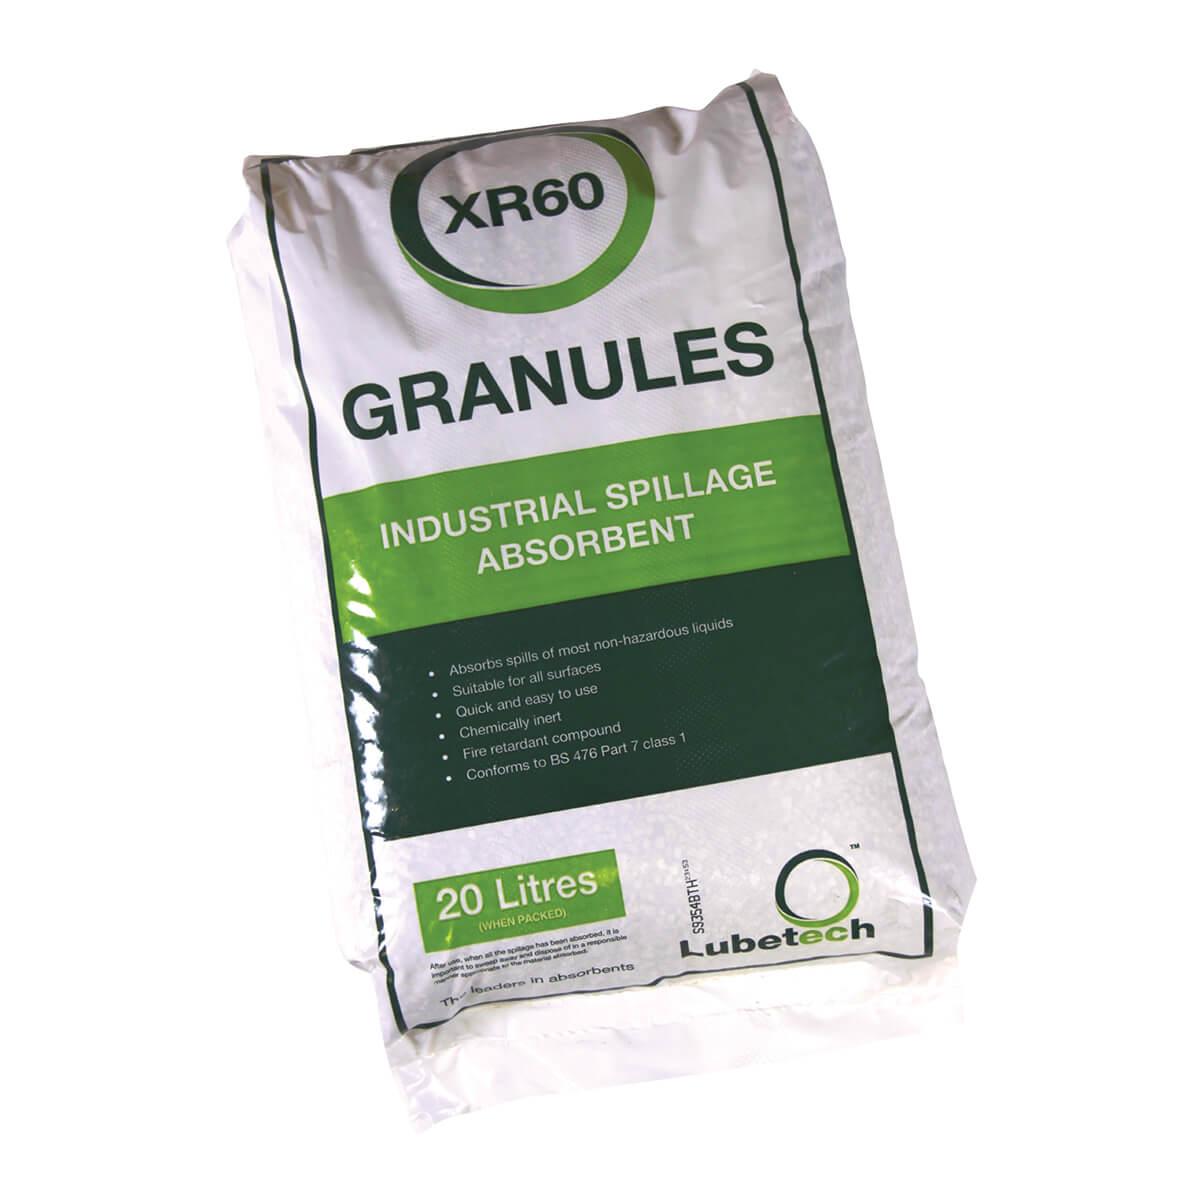 Oil Absorbent Granules - 20 Litres